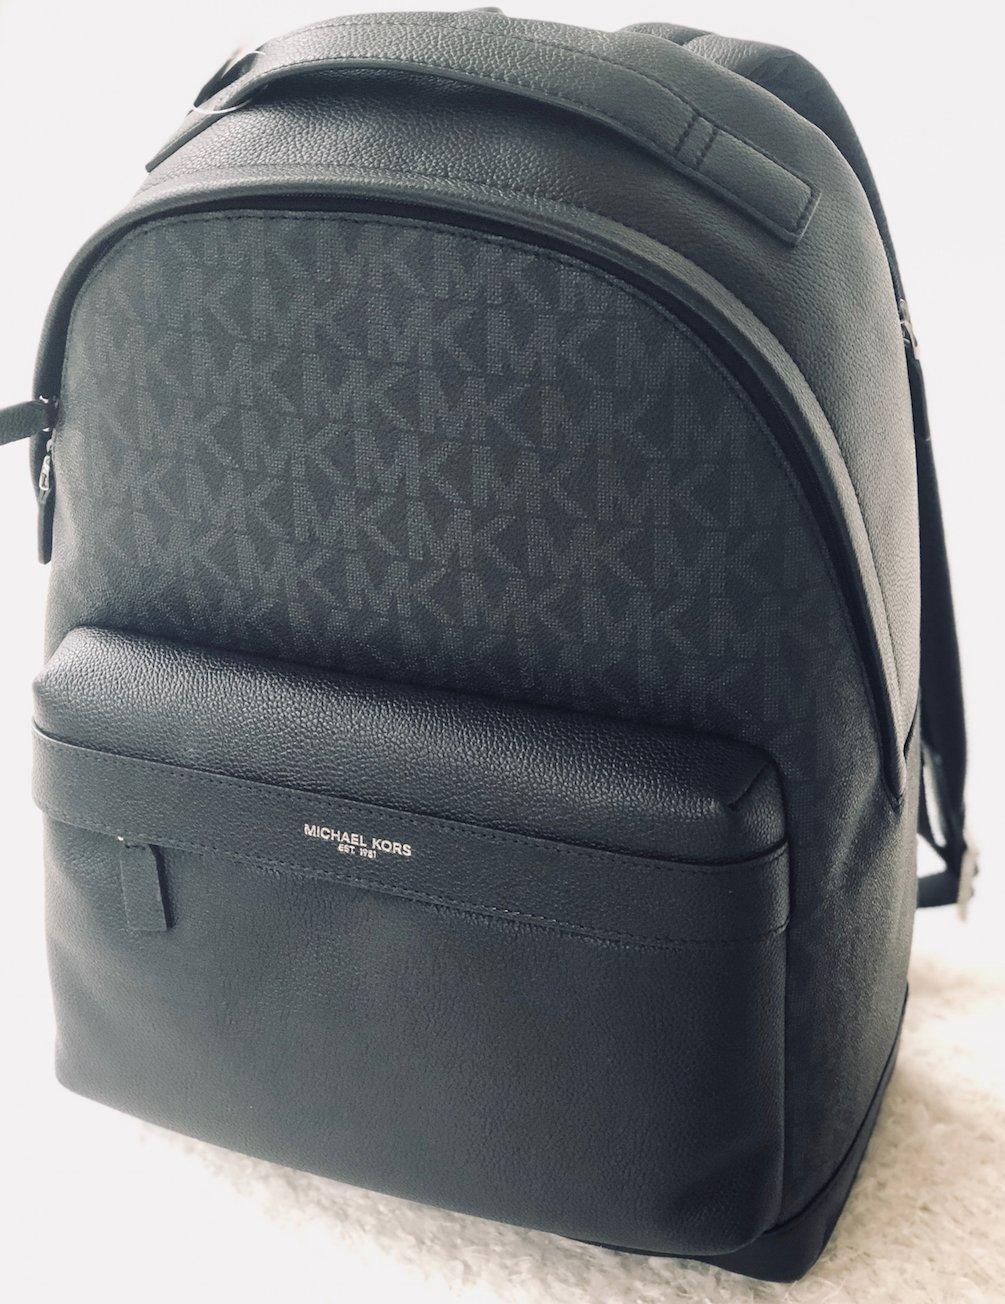 6d40a3306a85 Amazon.com: Michael Kors Mens Russel Black Signature Leather Backpack Bag:  DezignerChic